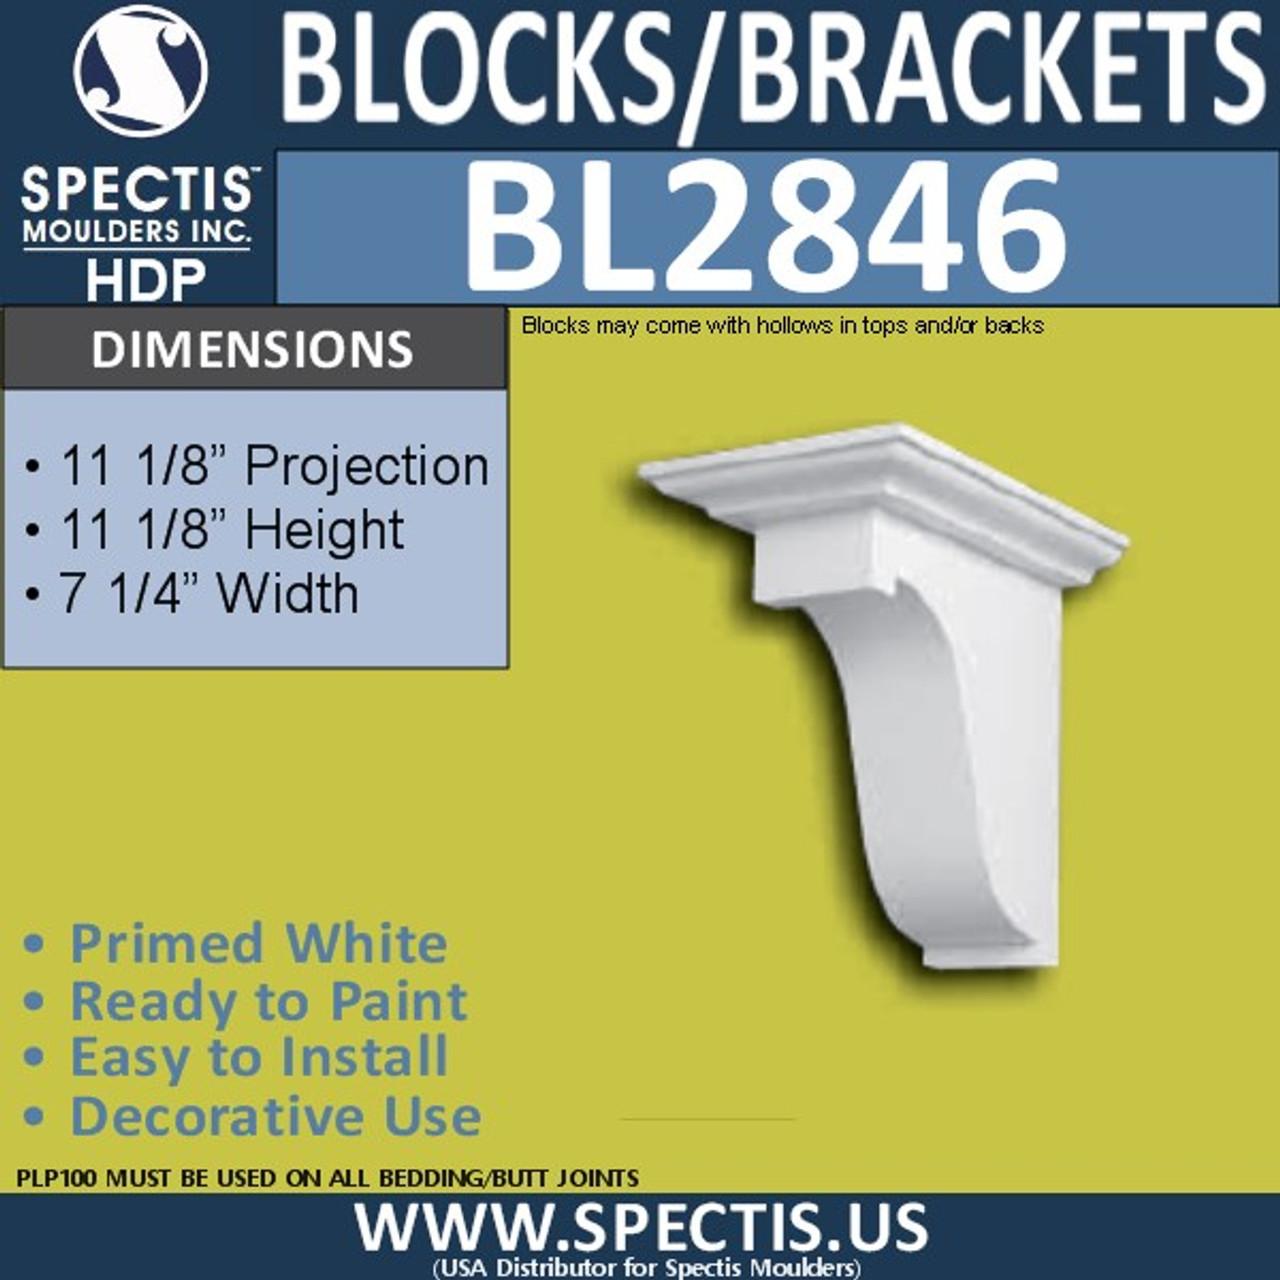 "BL2846 Eave Block or Bracket 7.25""W x 11.25""H x 11.25"" P"